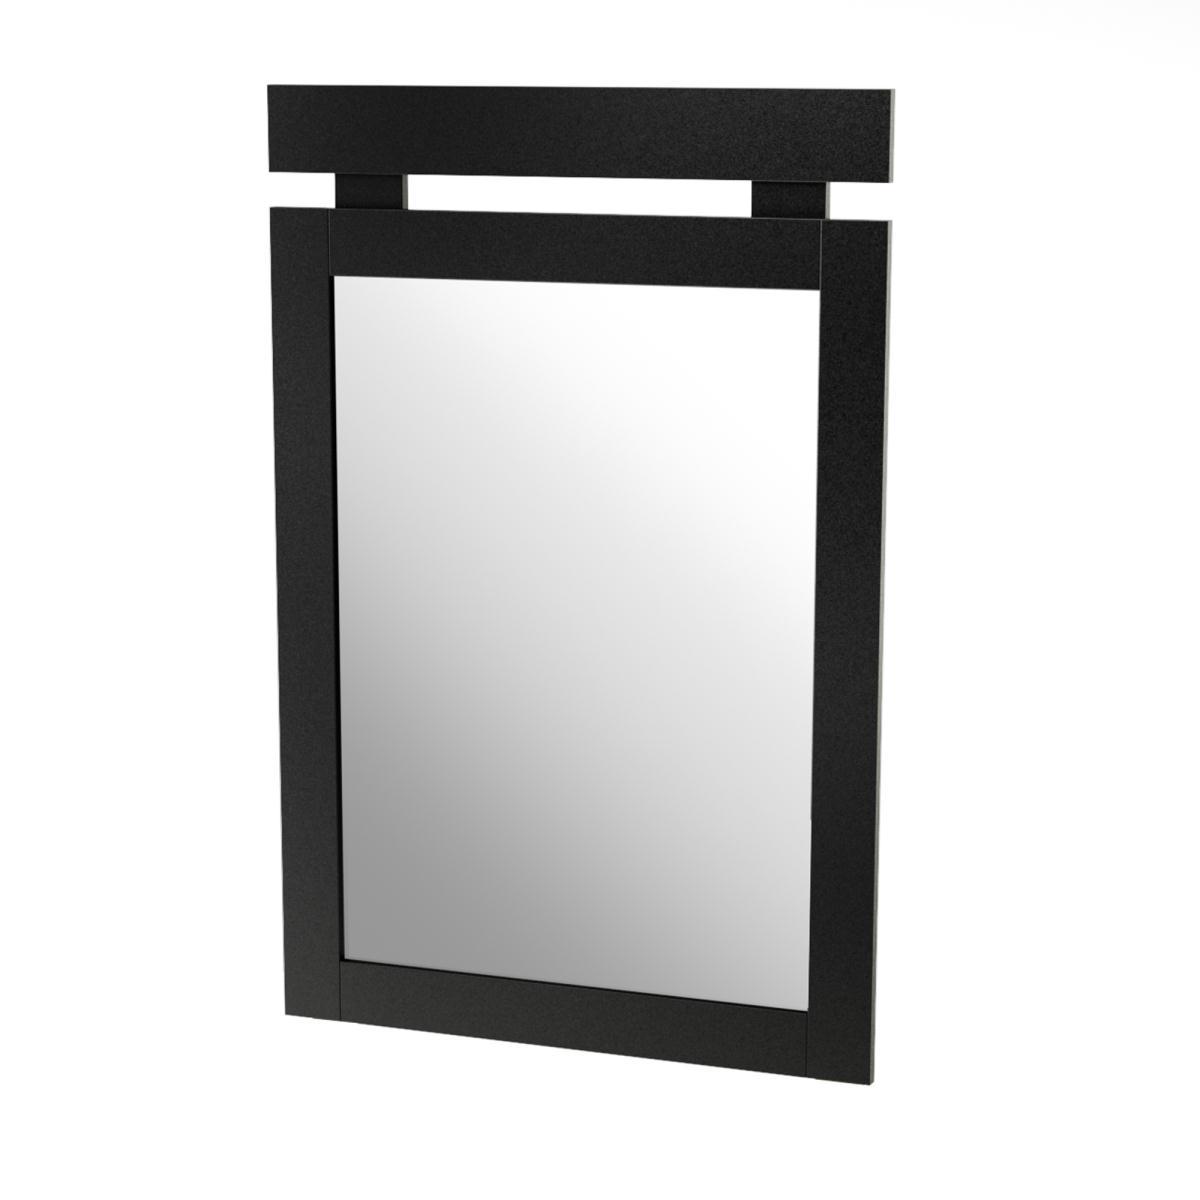 South Shore Spark Mirror 29 Inch x 43 Inch - Pure Black